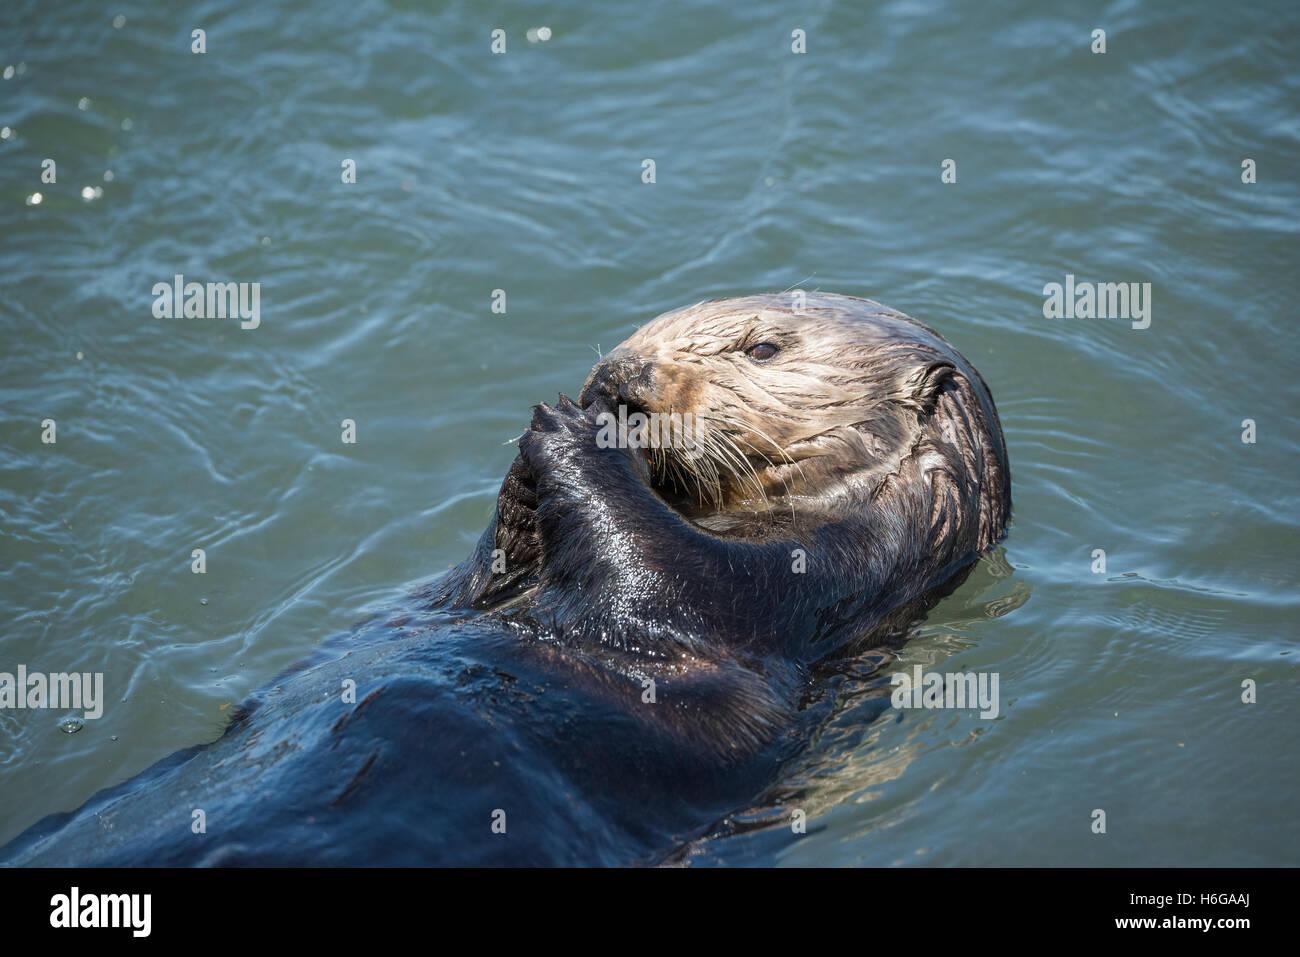 California sea otter, Enhydra lutris nereis ( threatened species ), eating a mussel, Elkhorn Slough, Moss Landing, - Stock Image